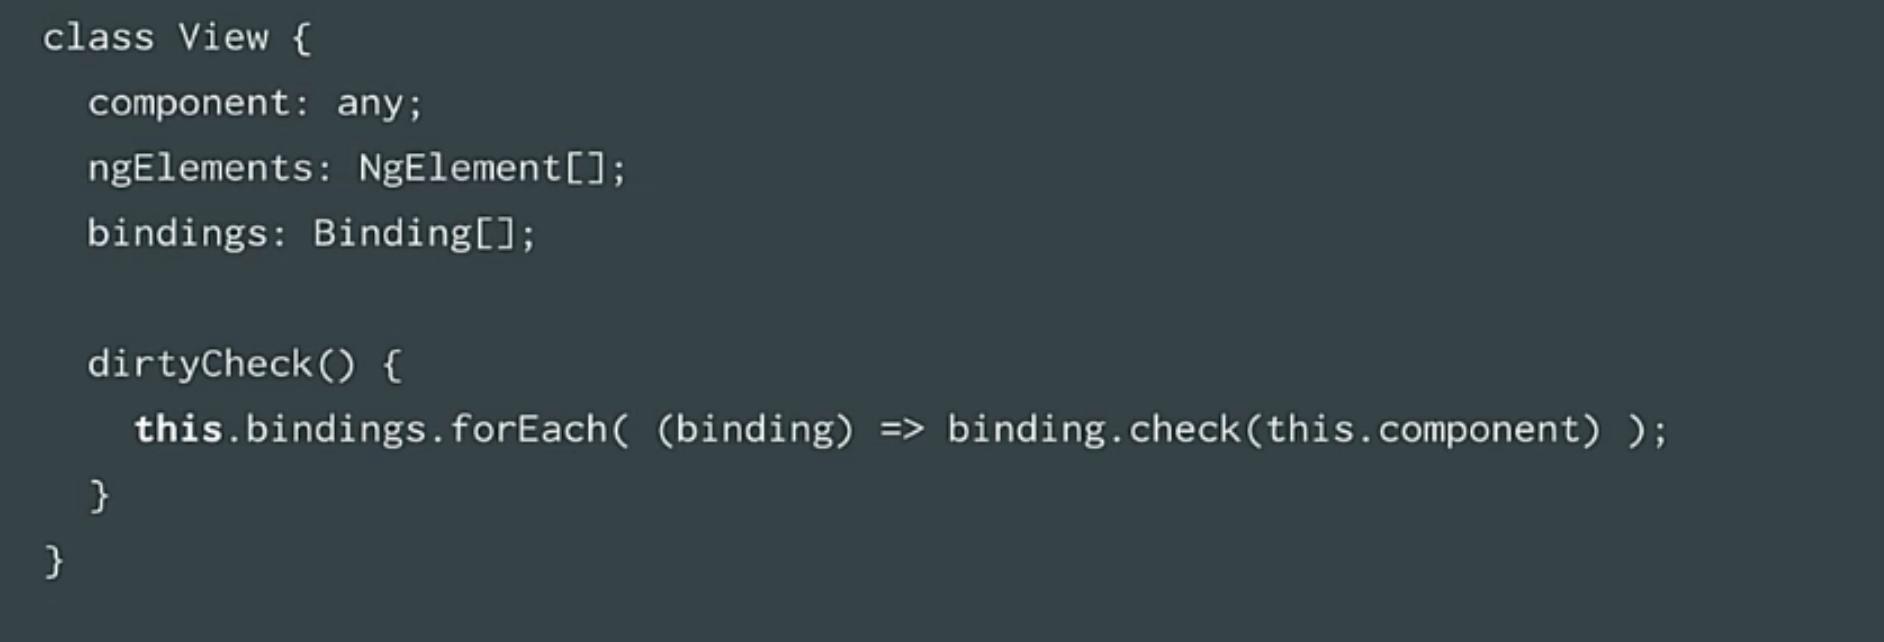 angular2 compiler view